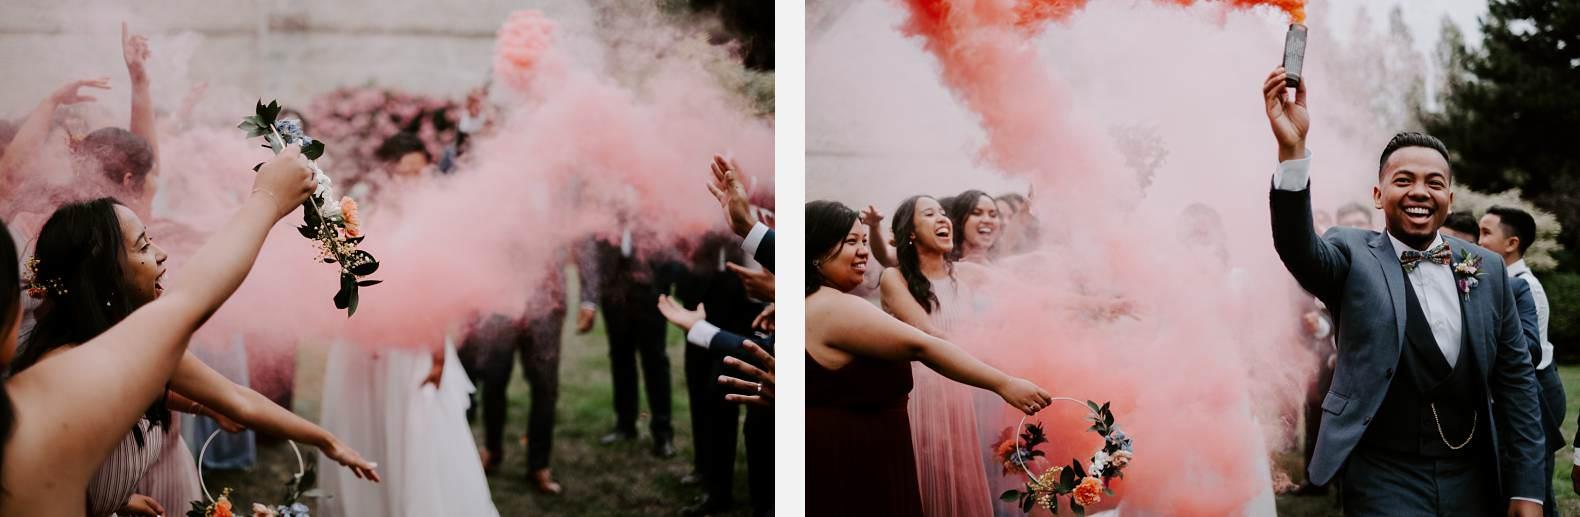 mariage manoir de corny photographe bel esprit 0049 1